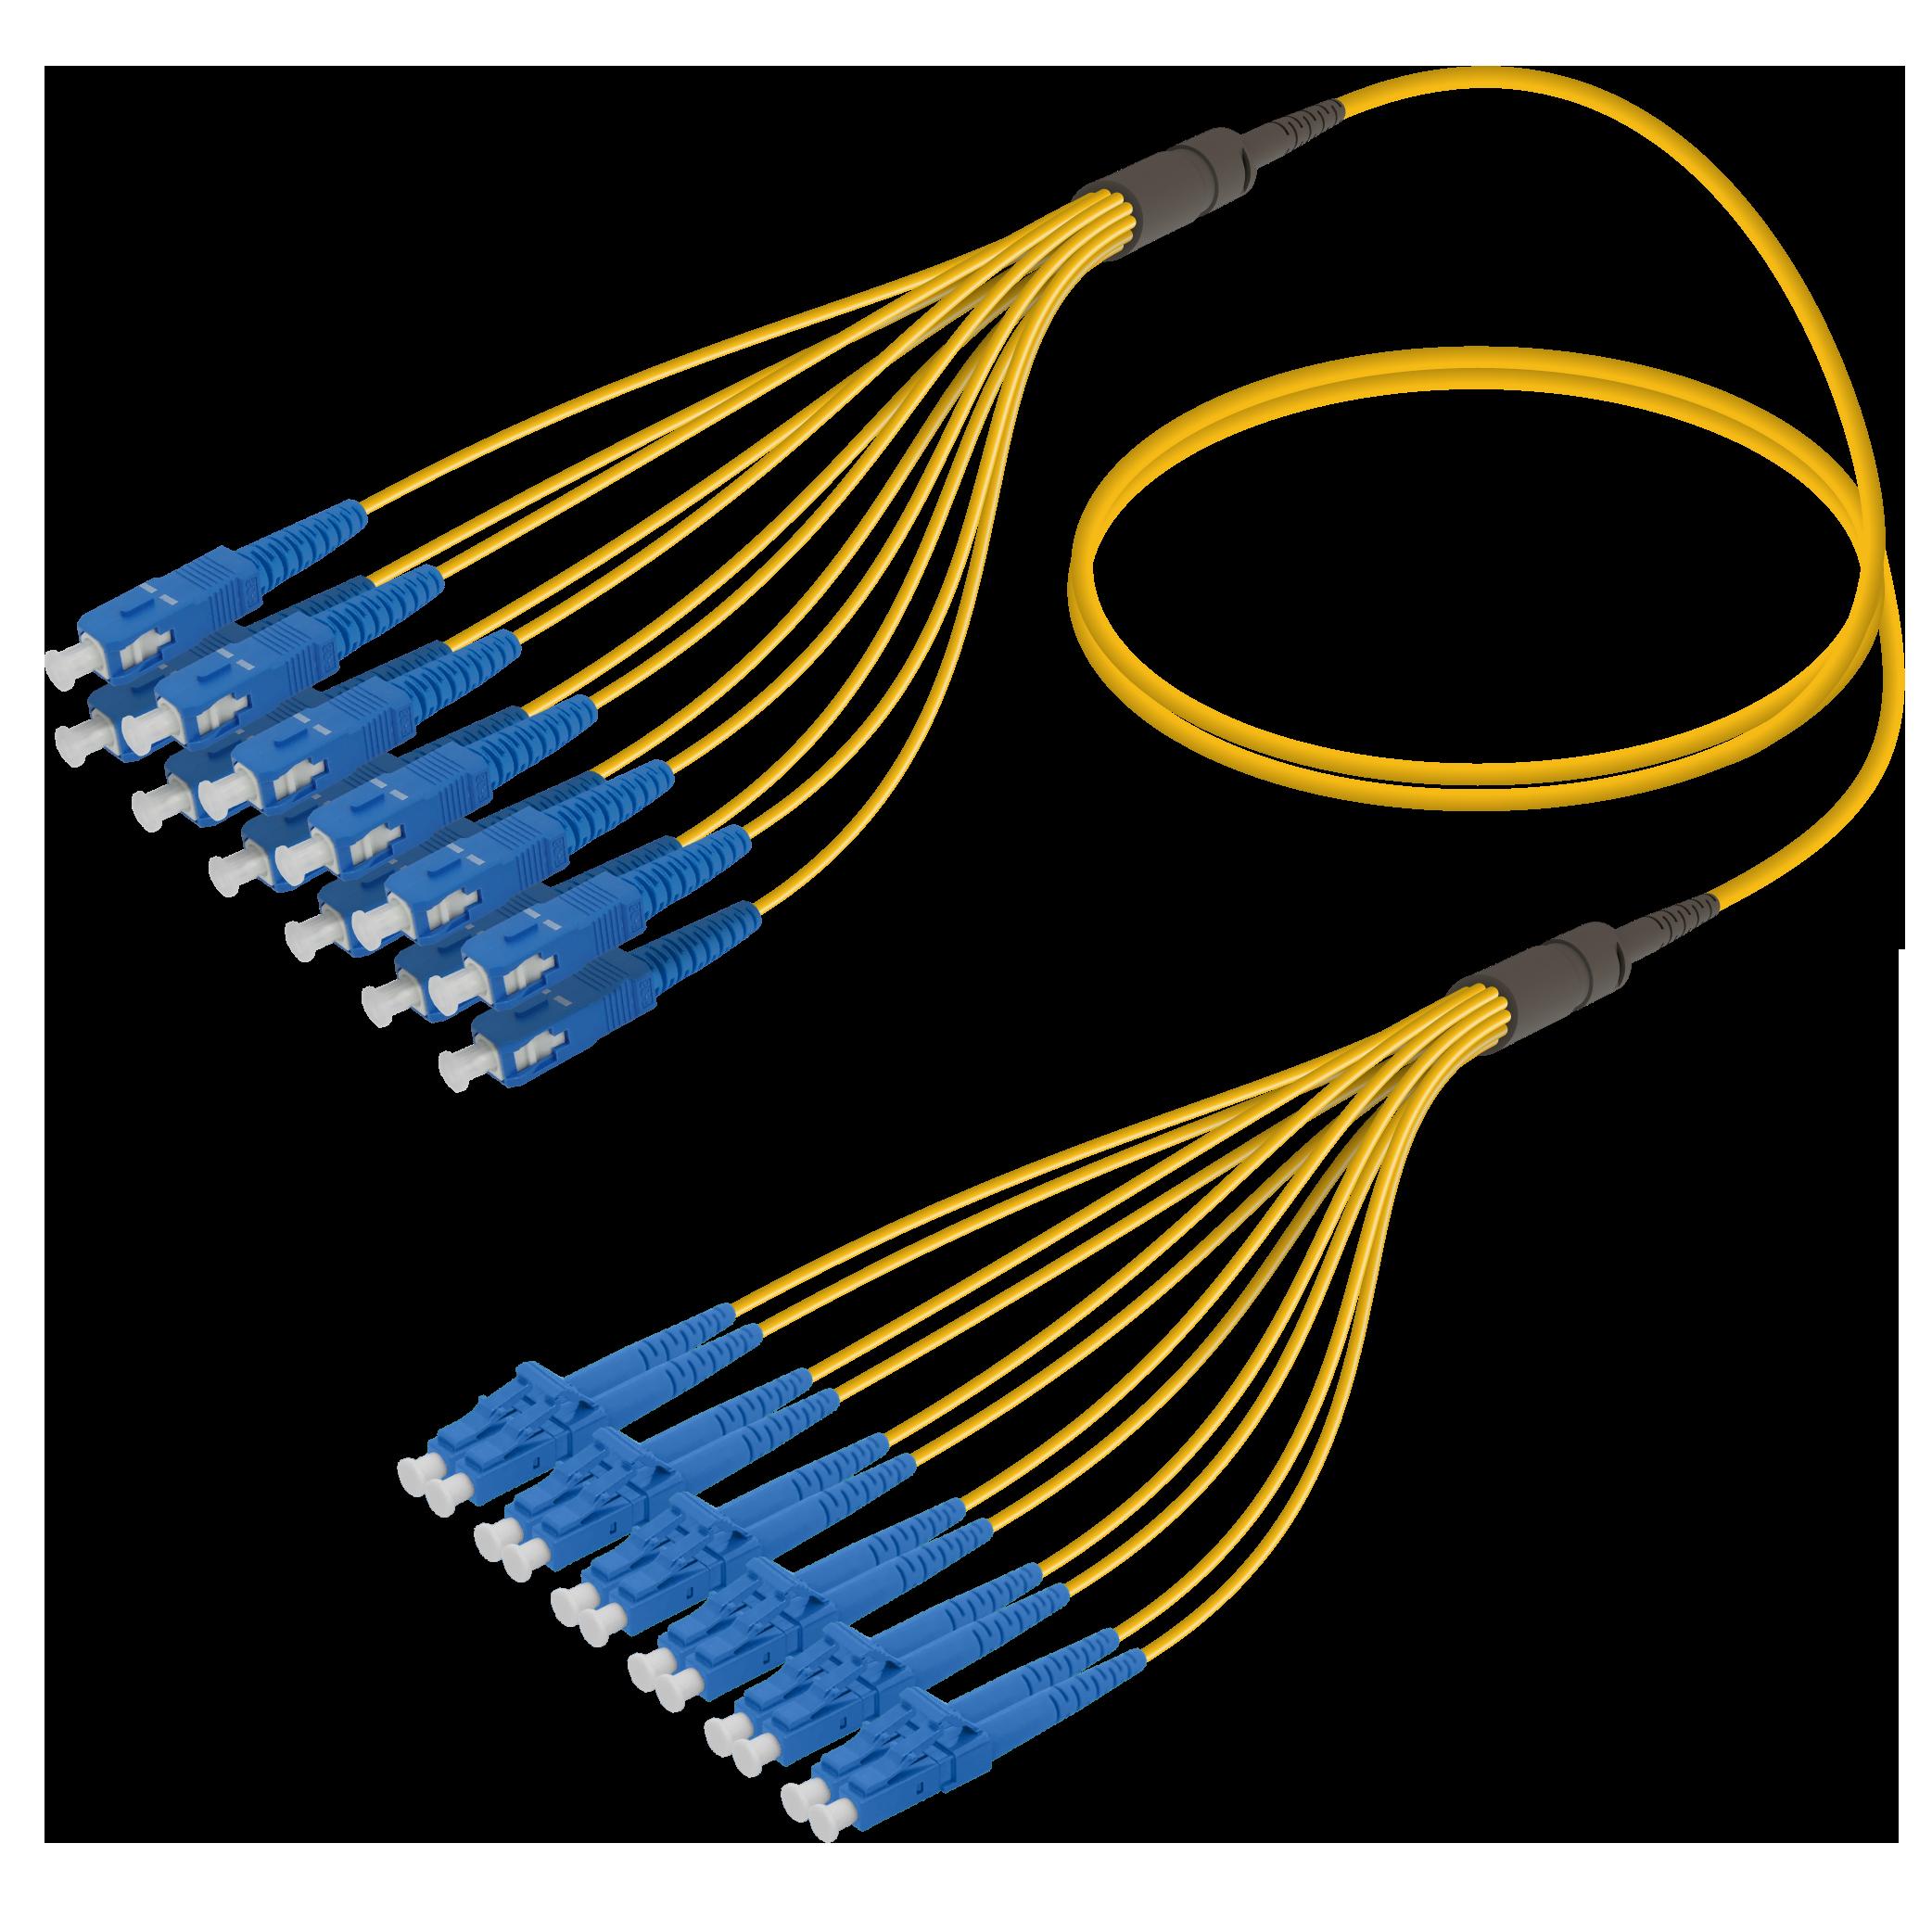 SC/UPC-LC/UPC | 12 Fibers Fanout | Single Mode G657.A2 | 3.0/1.8mm